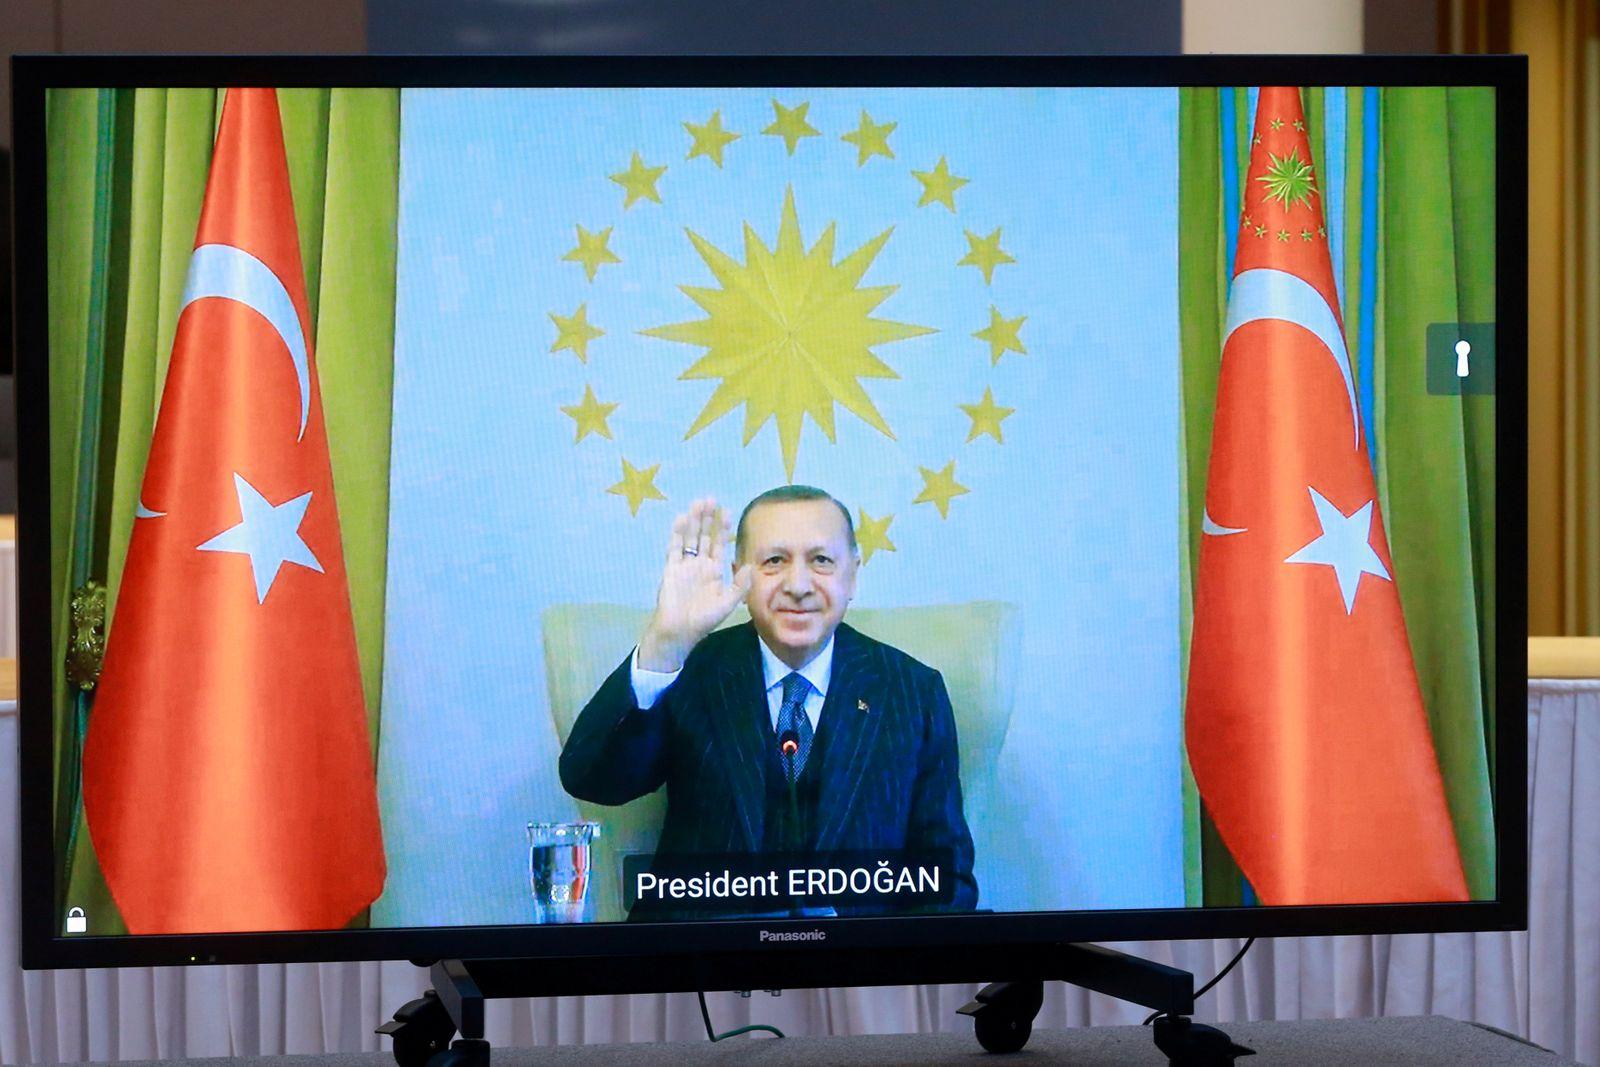 EU Commission President von der Leyen and EU Council President Michel hold video call with Turkey's President Erdogan